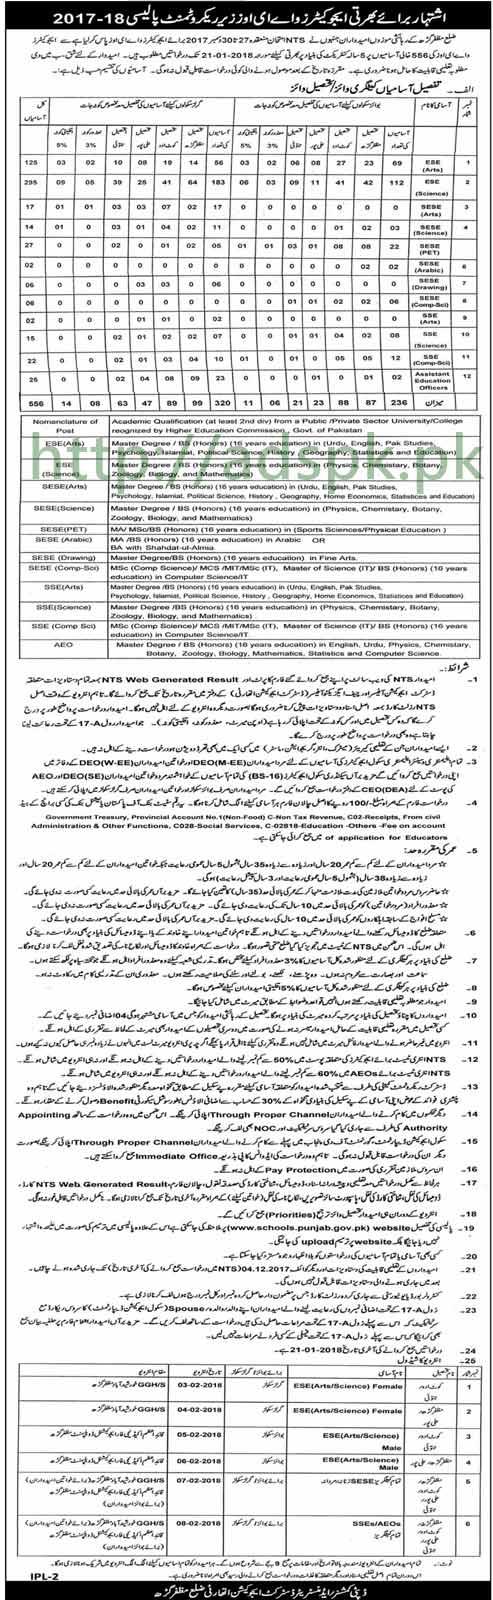 Punjab Educators District Muzaffargarh Jobs 2018 Interview Schedule Educators AEOs Tehsil wise (556 Vacancies) Jobs Application Deadline 21-01-2018 Apply Now